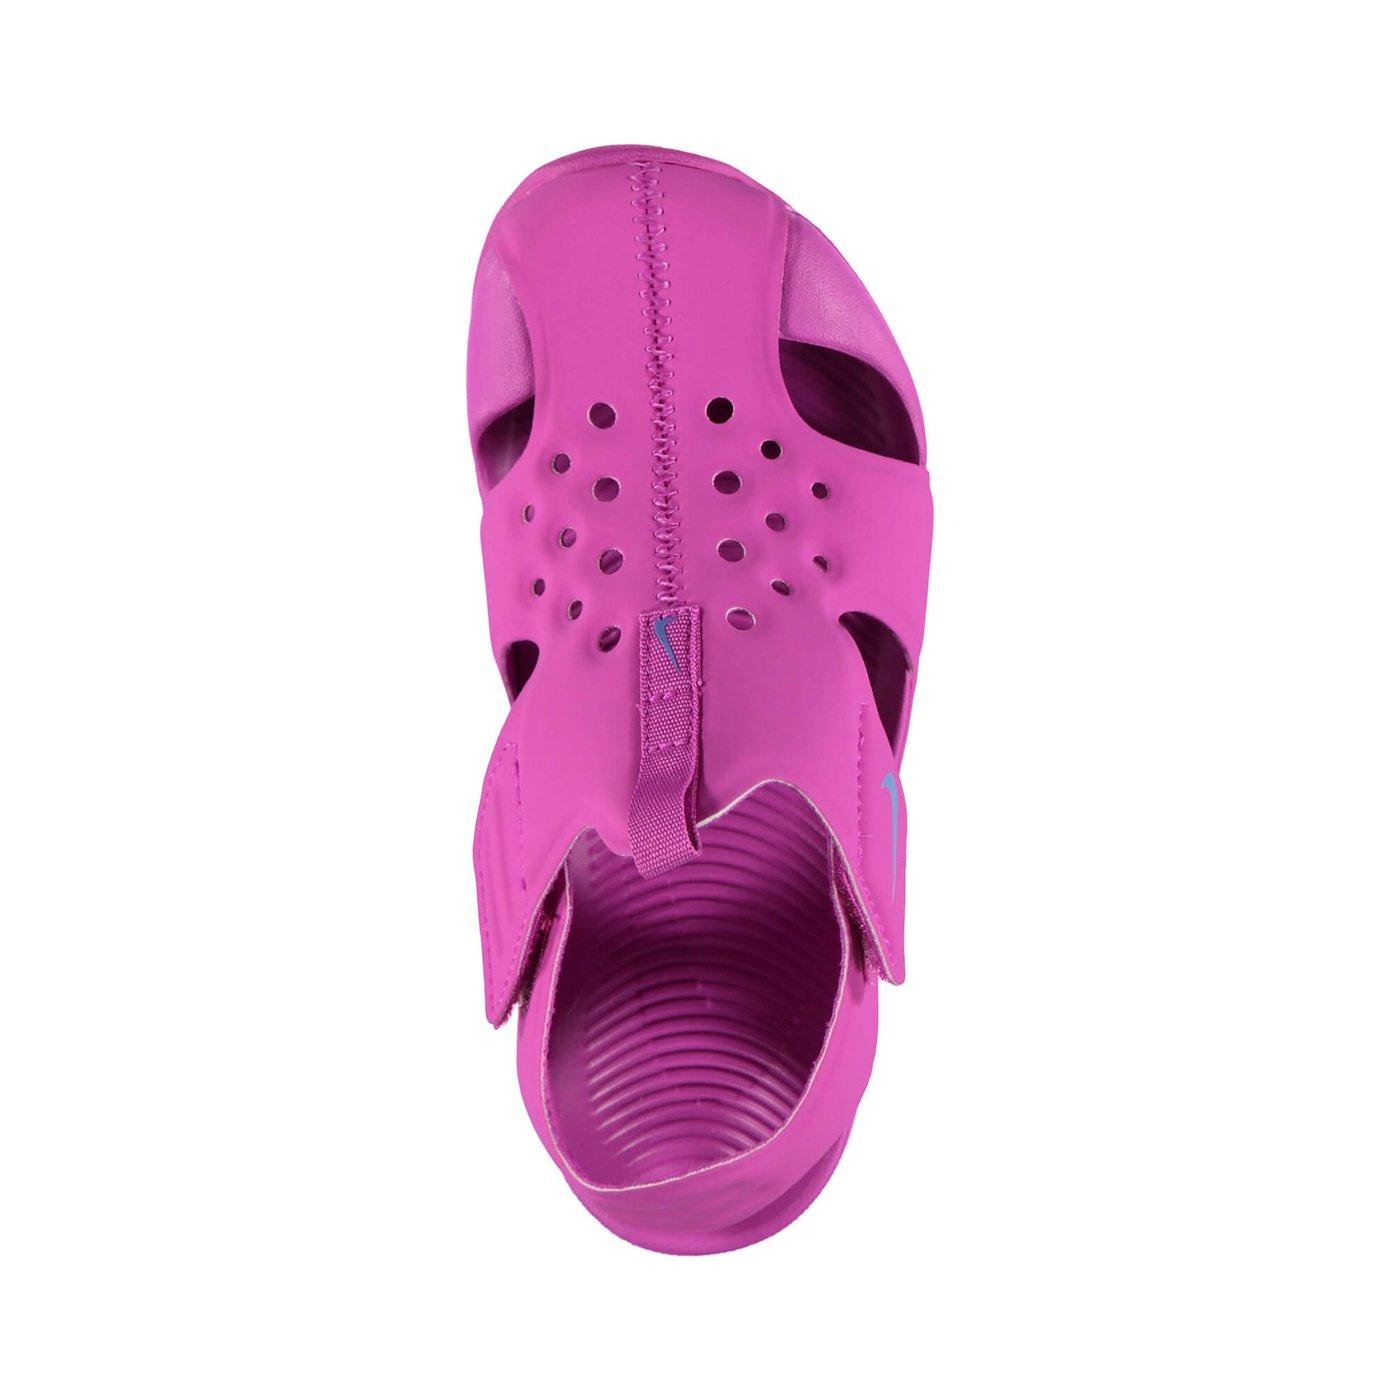 Nike Çocuk Pembe Sandalet